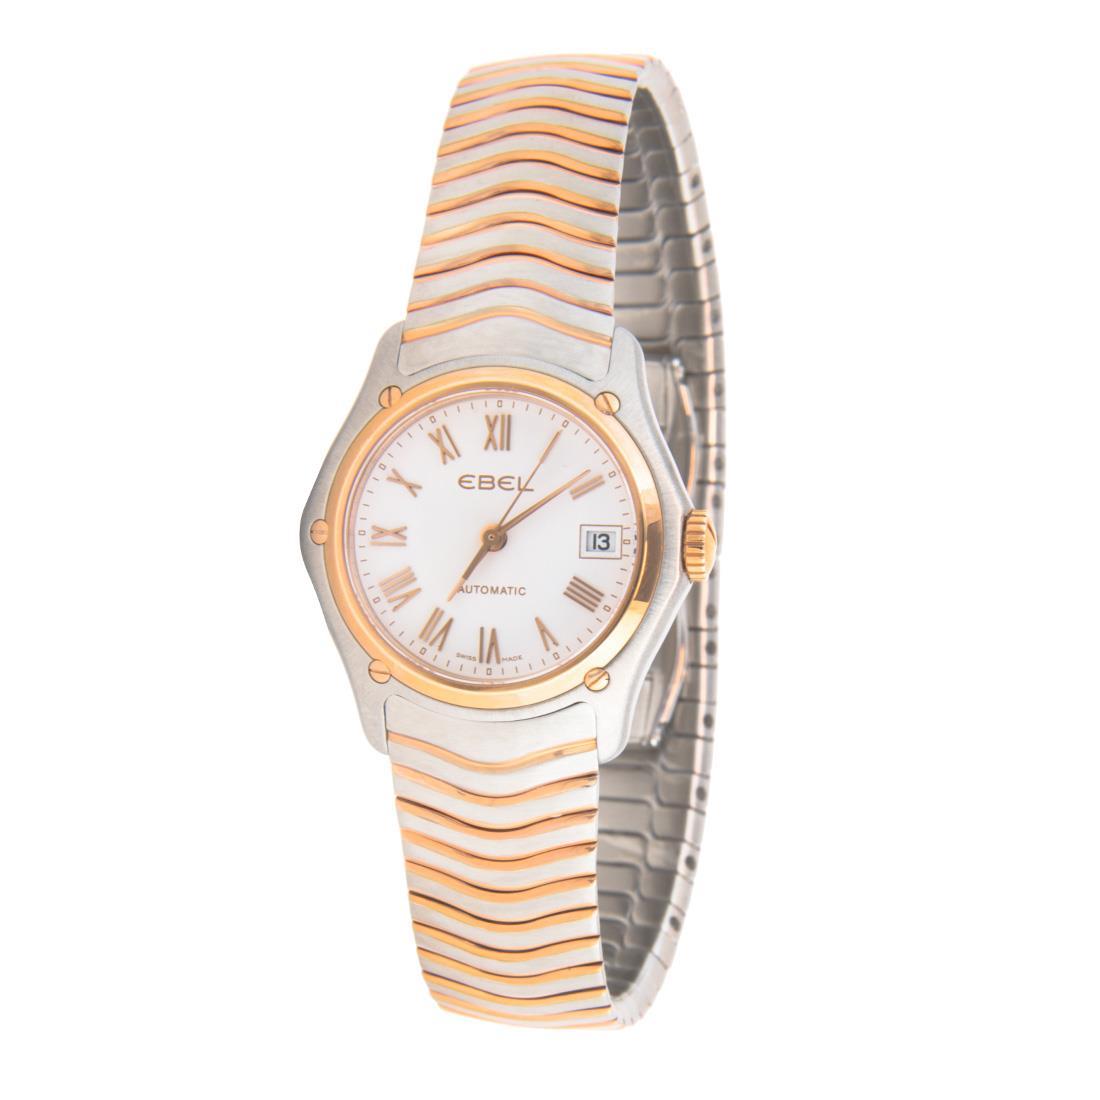 Orologio Ebel Classic da donna cassa 27mm - EBEL